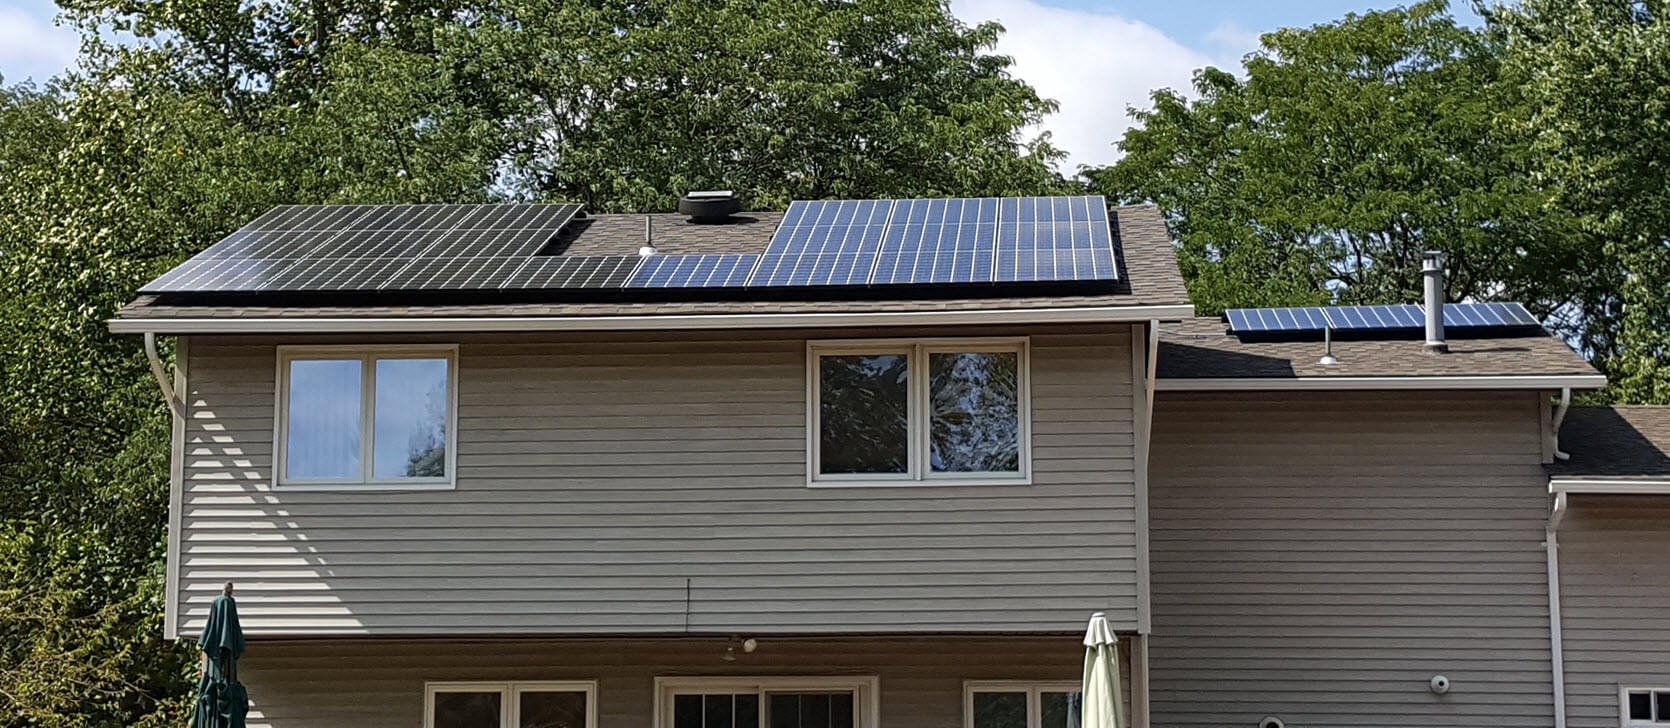 new jersey solar panel installation